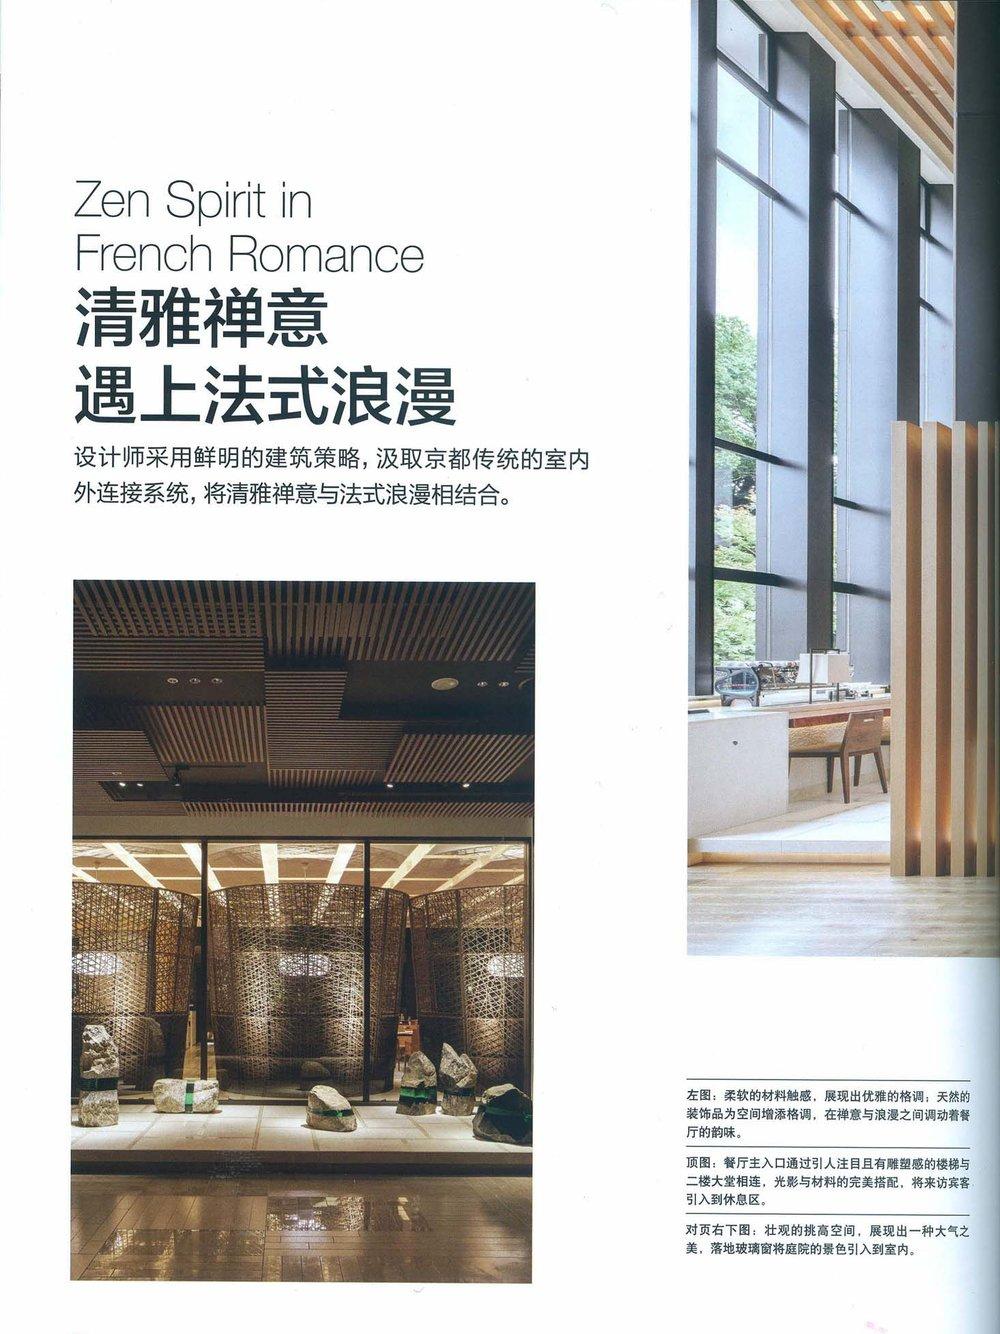 Trends | June 2017 - Brasserie at Four Seasons Hotel Kyoto | Kokaistudios